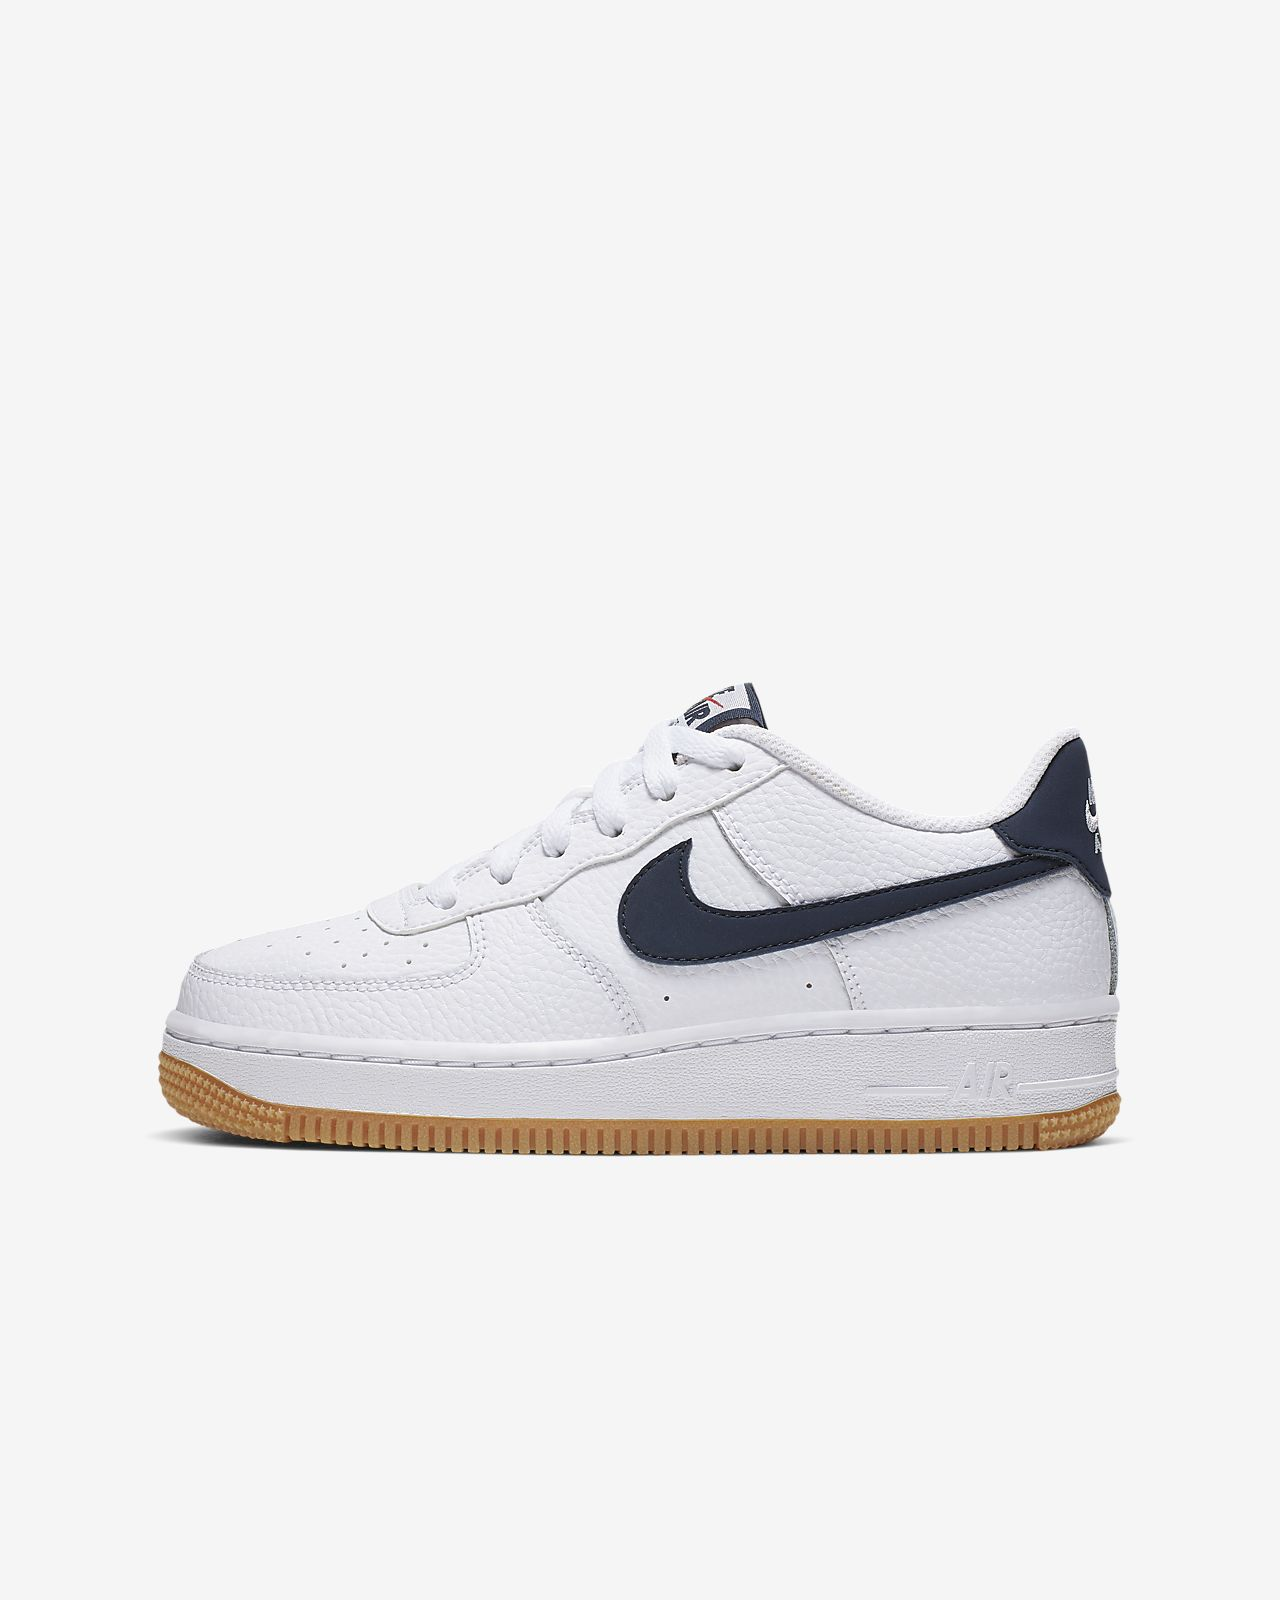 Calzado para niños talla grande Nike Air Force 1 2